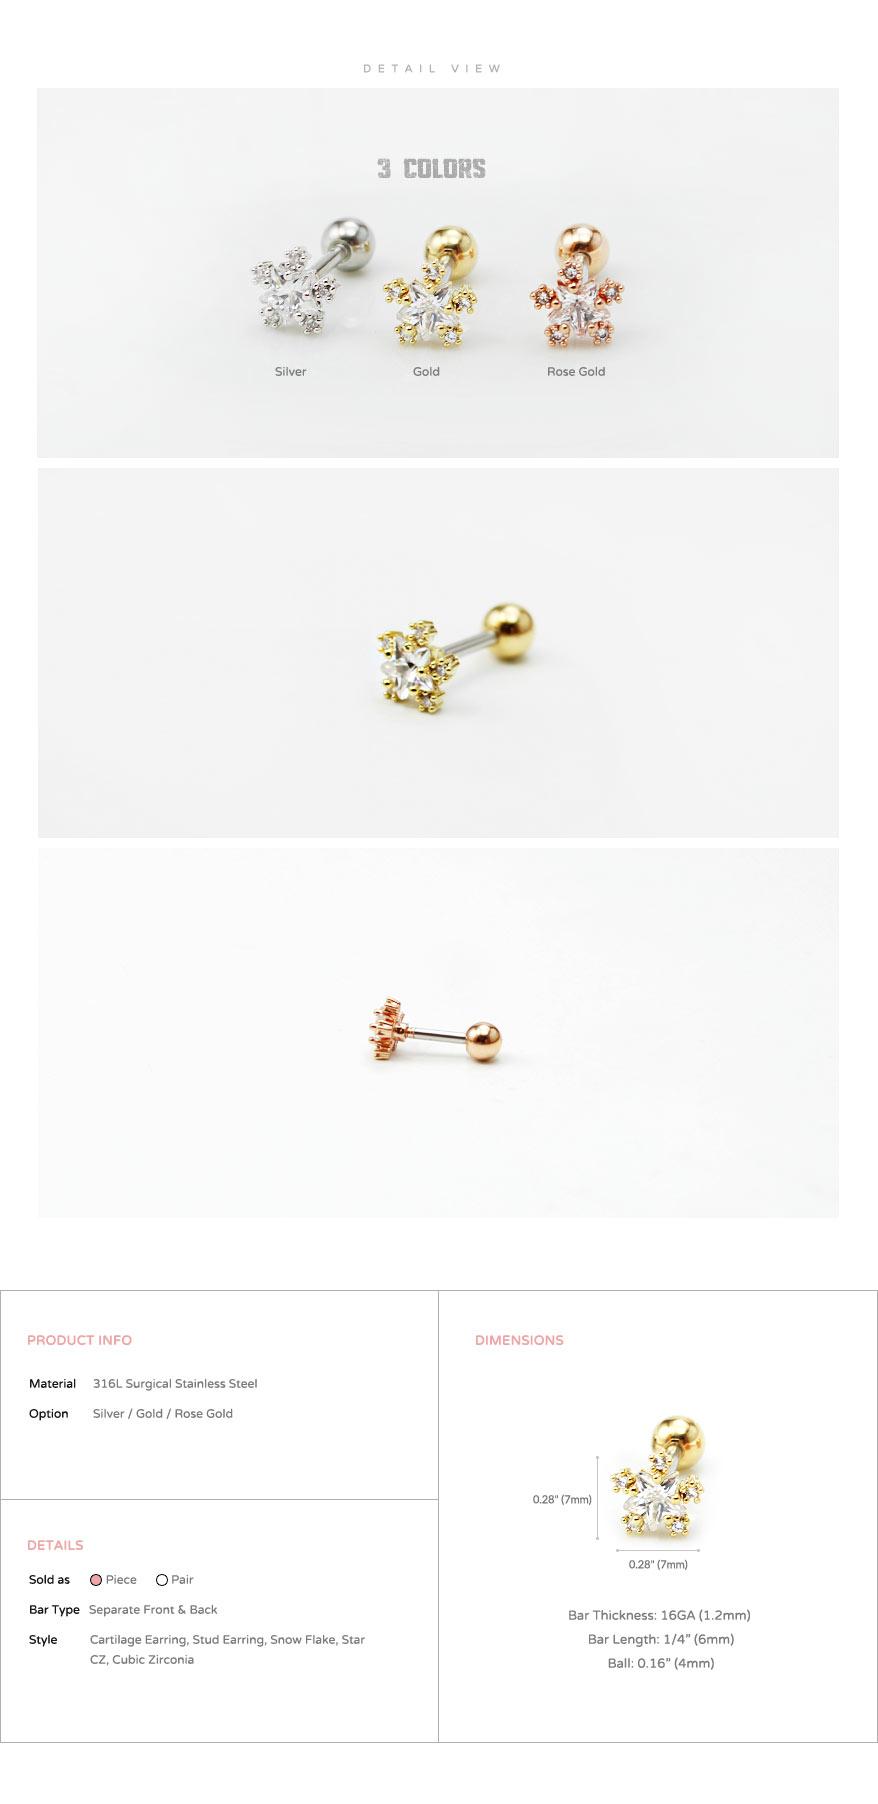 jewelry_earrings_stud_cartilage_piercing_16g_barbell_316l_cz_conch_helix_triple_star_flower_starflake_snow_snowflake_5